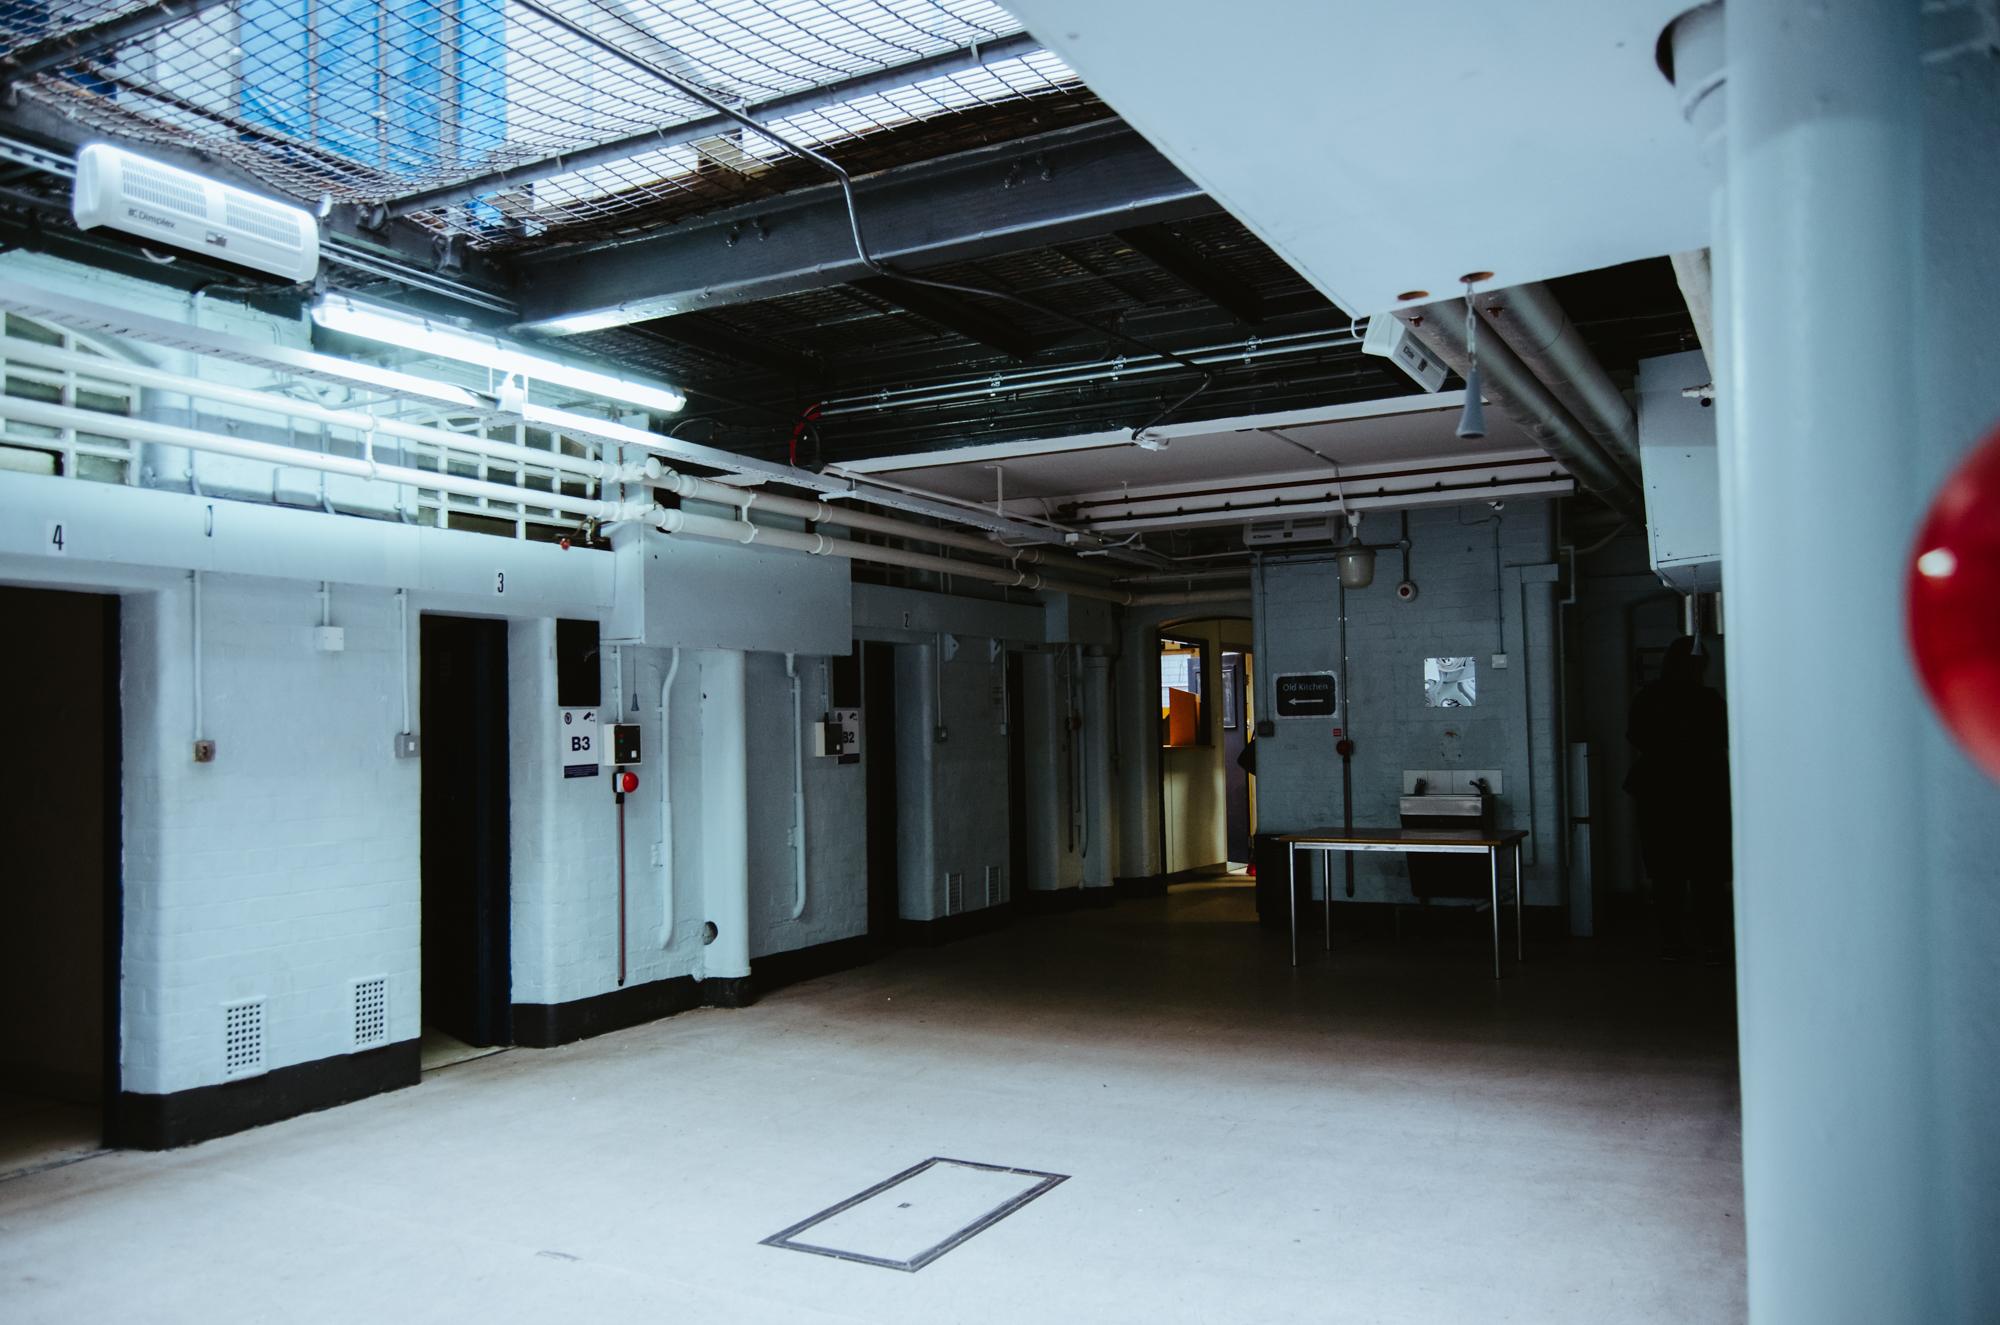 Steelhouse-Lane-Lock-Up-Birmingham-Hanny-Foxhall-_DSC2547.jpg